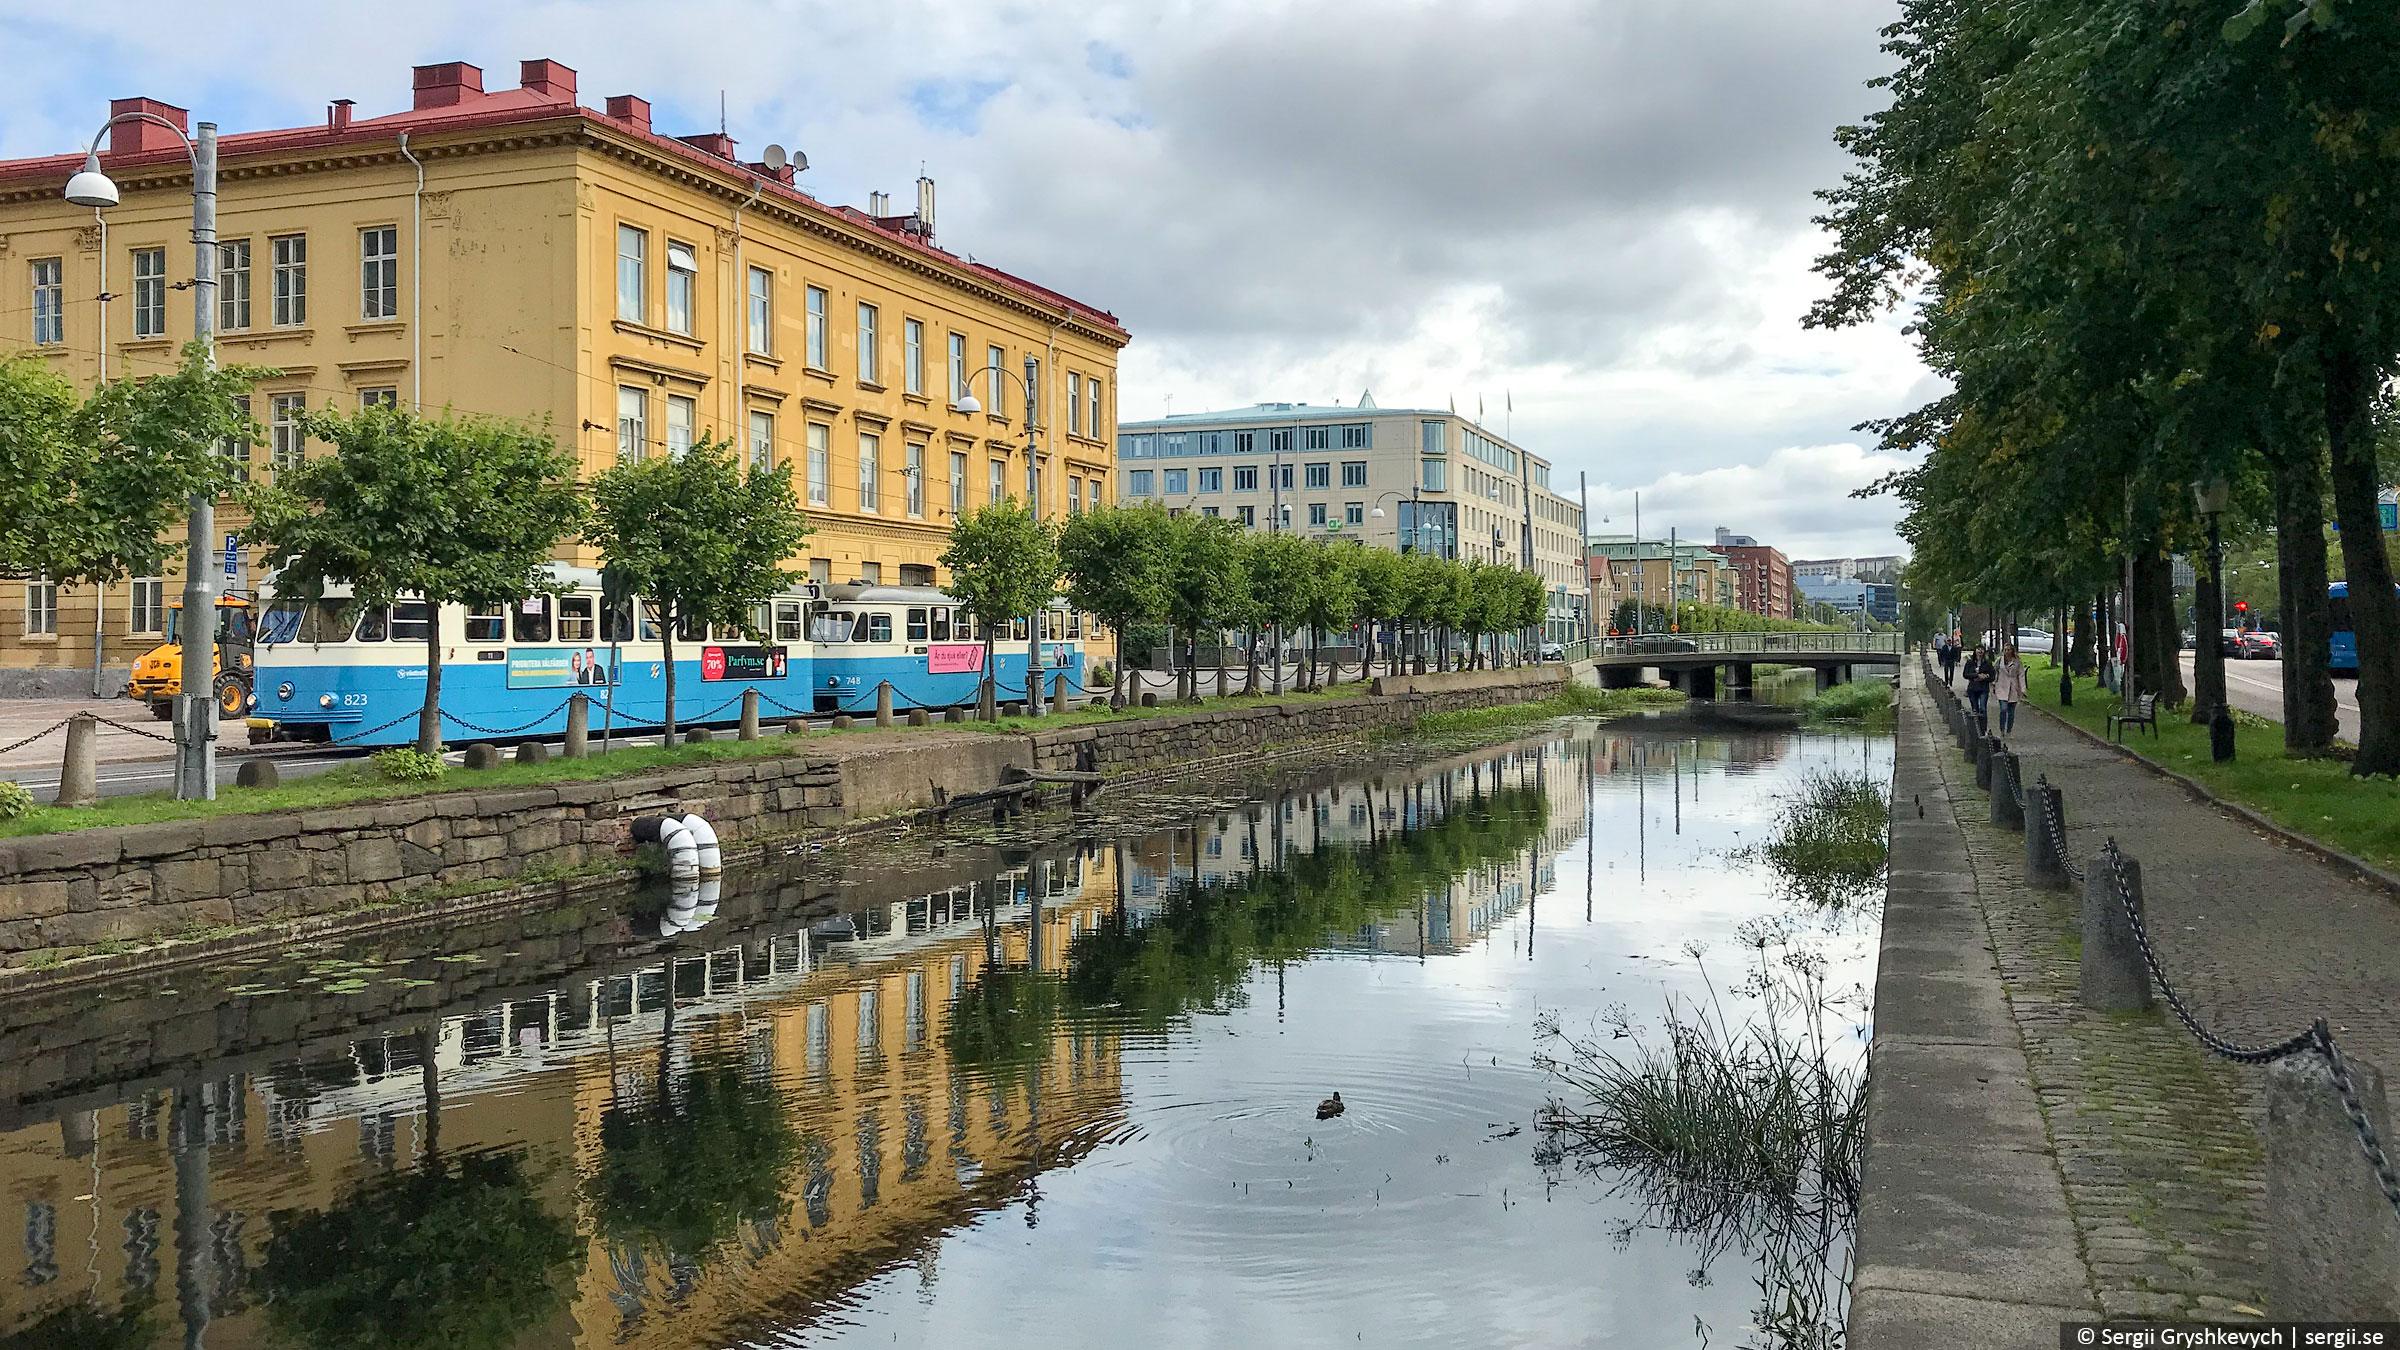 göteborg-ghotenburg-sweden-2018-3